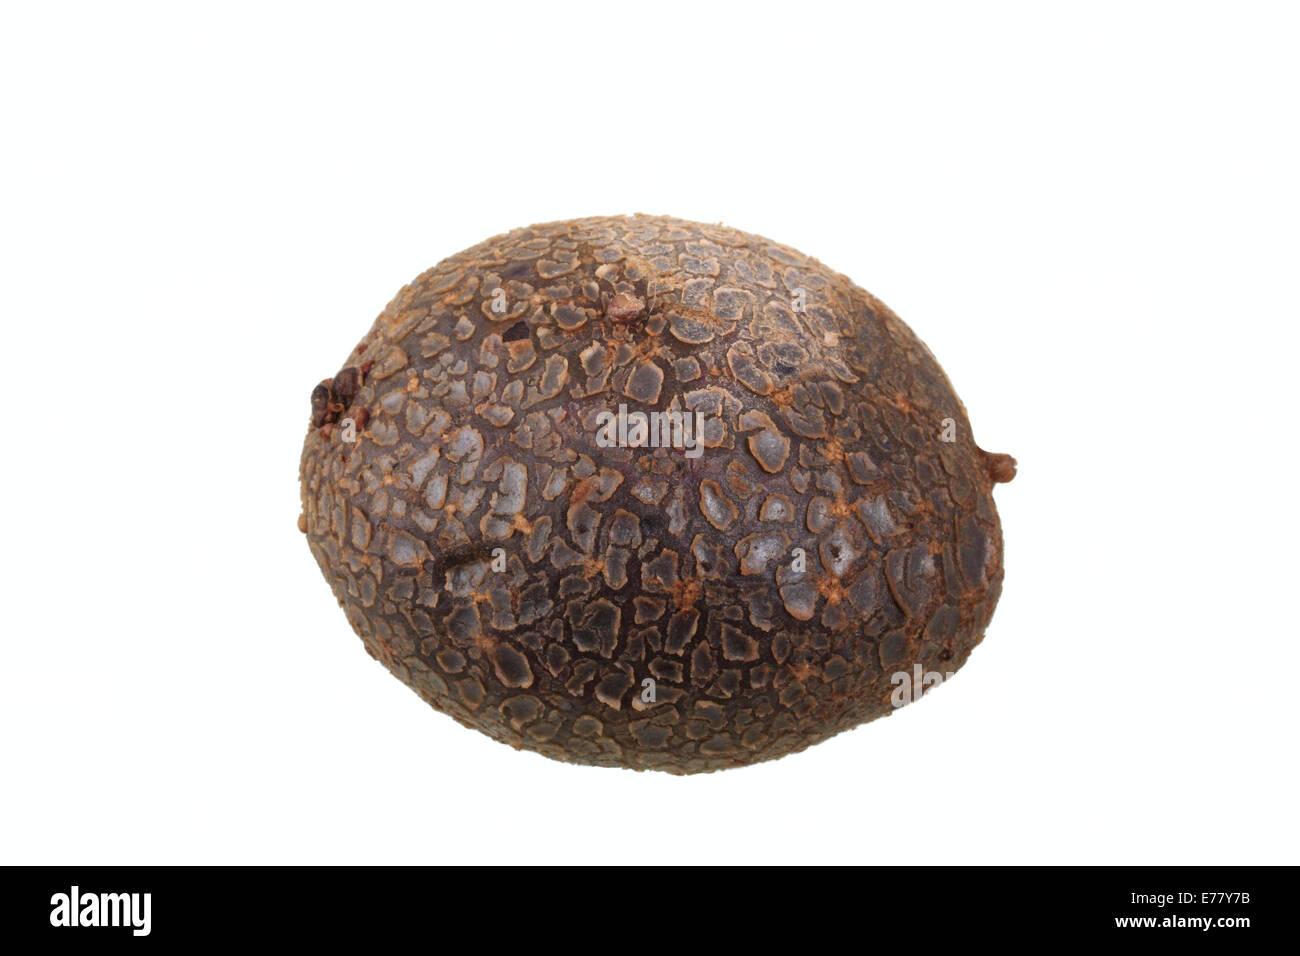 Potato, 'Blaue Anneliese' variety - Stock Image